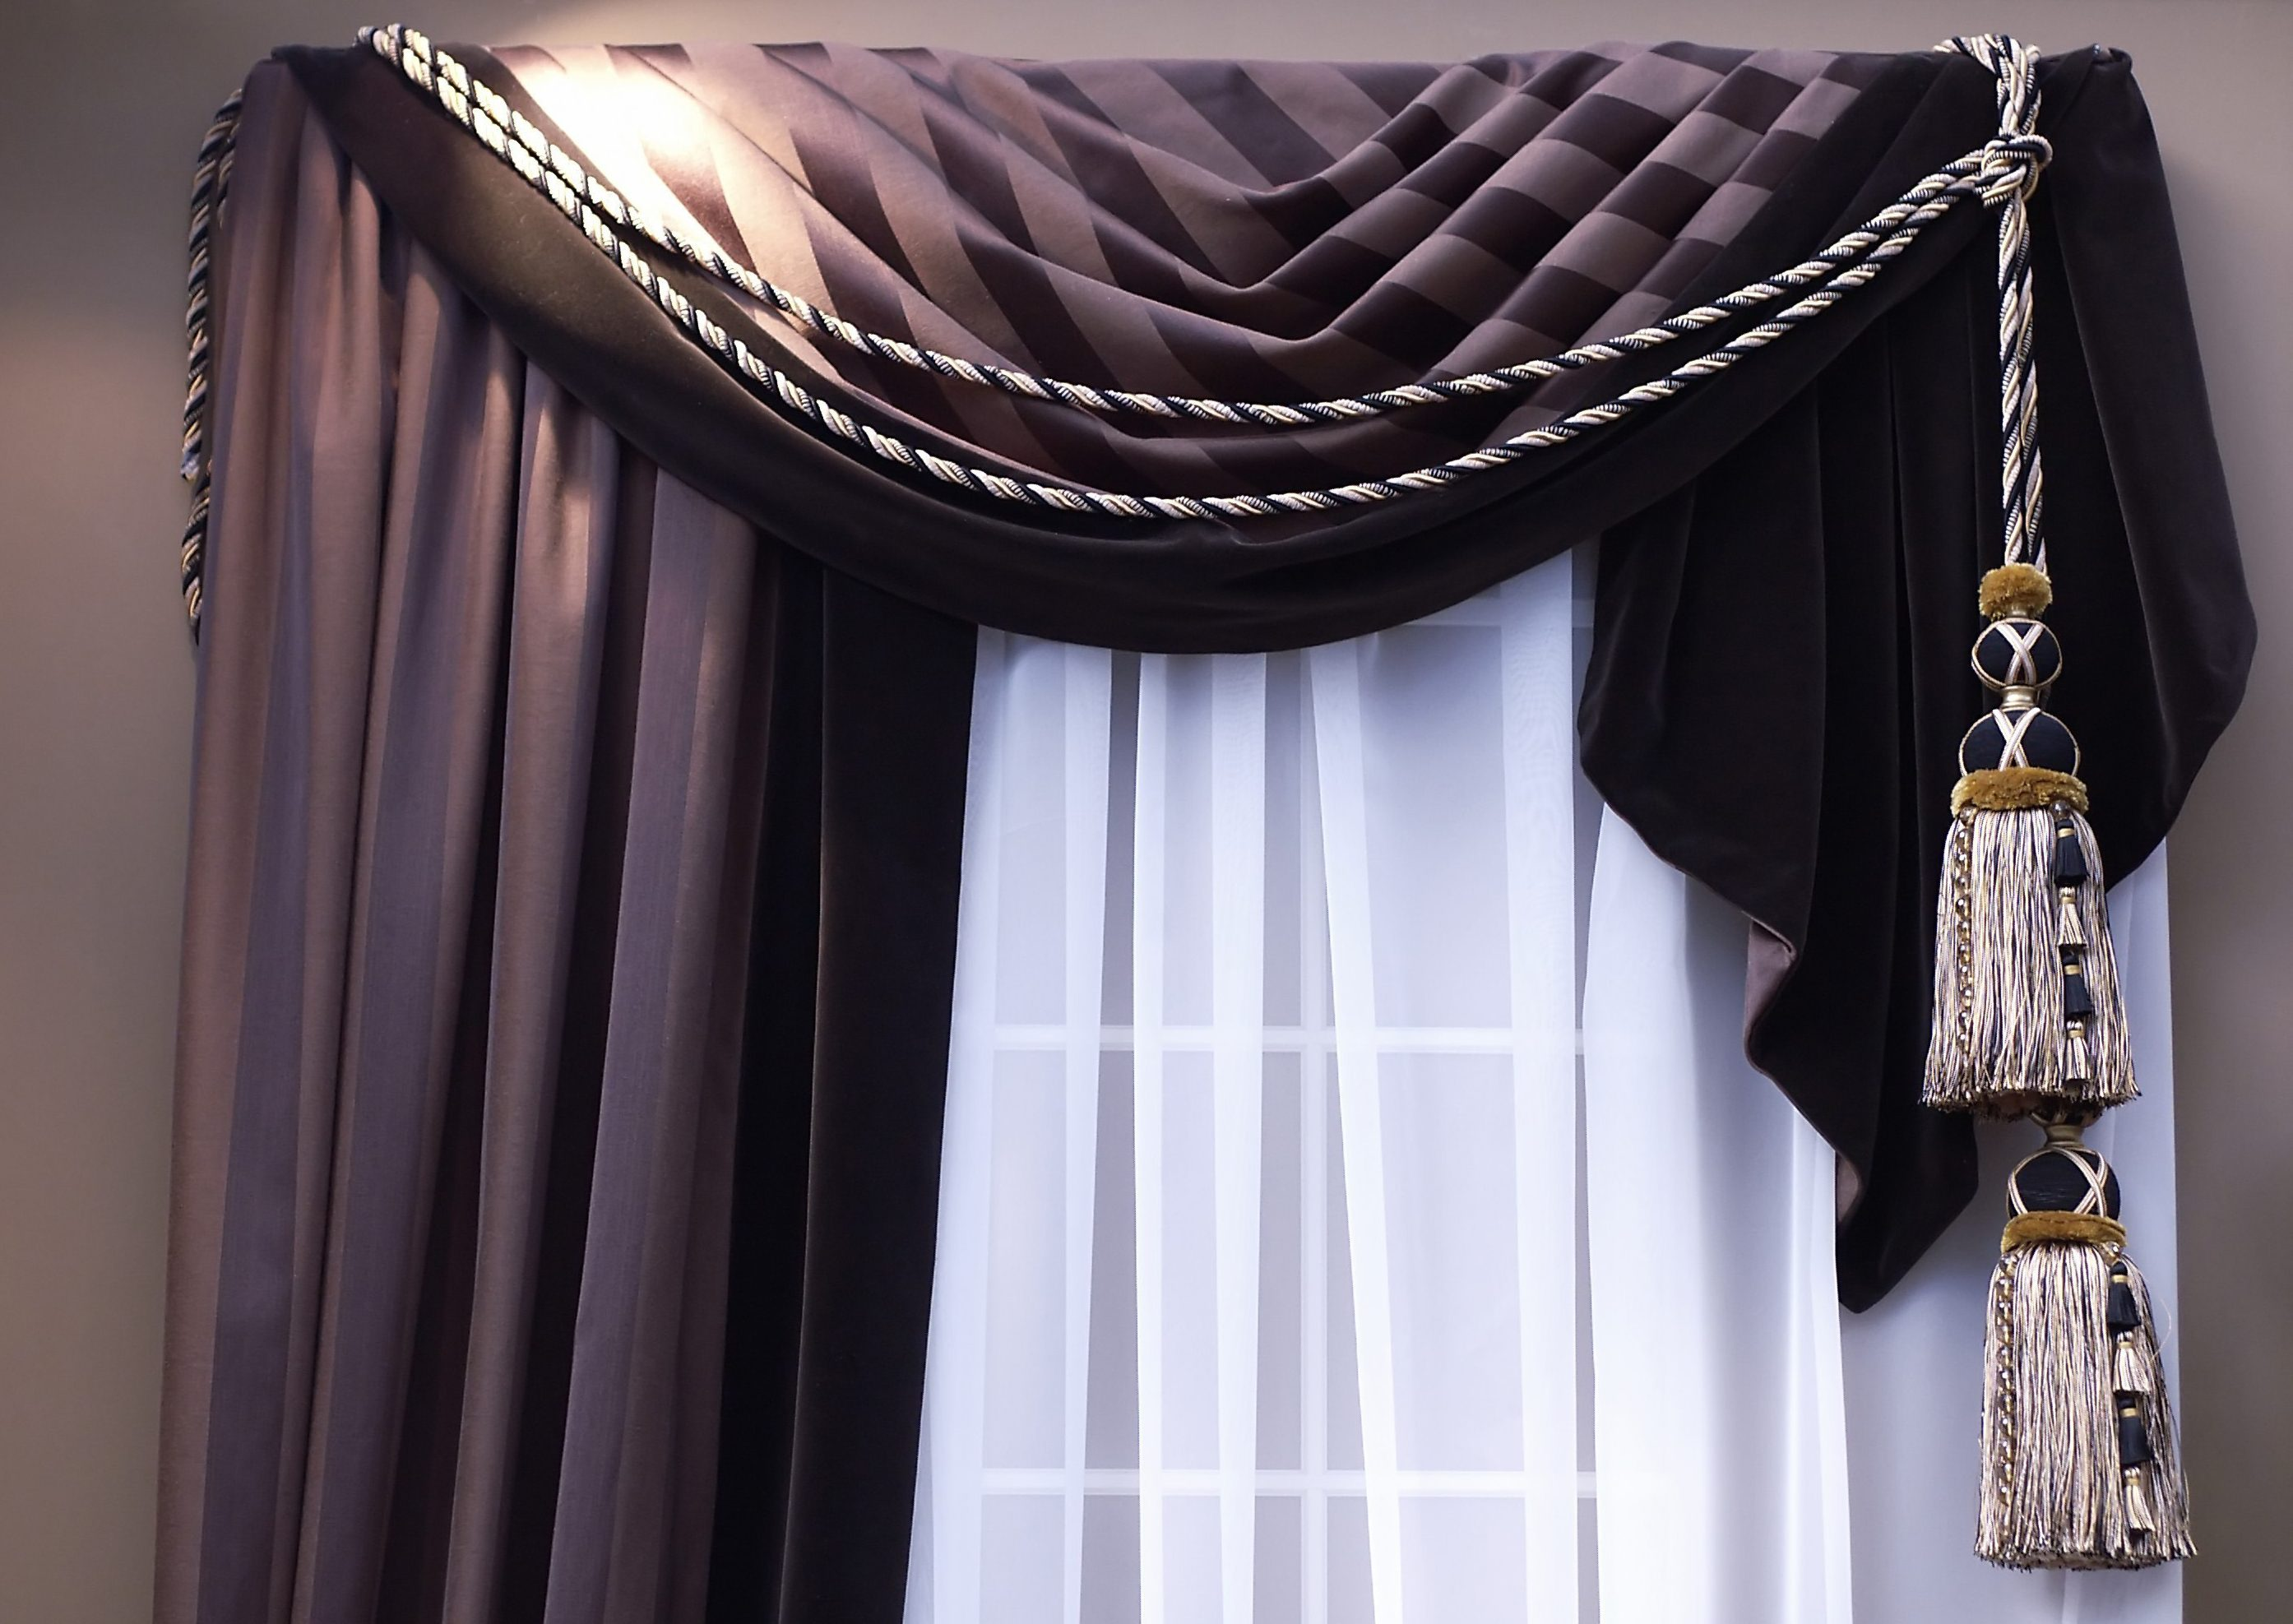 шторы на одну сторону окна идеи